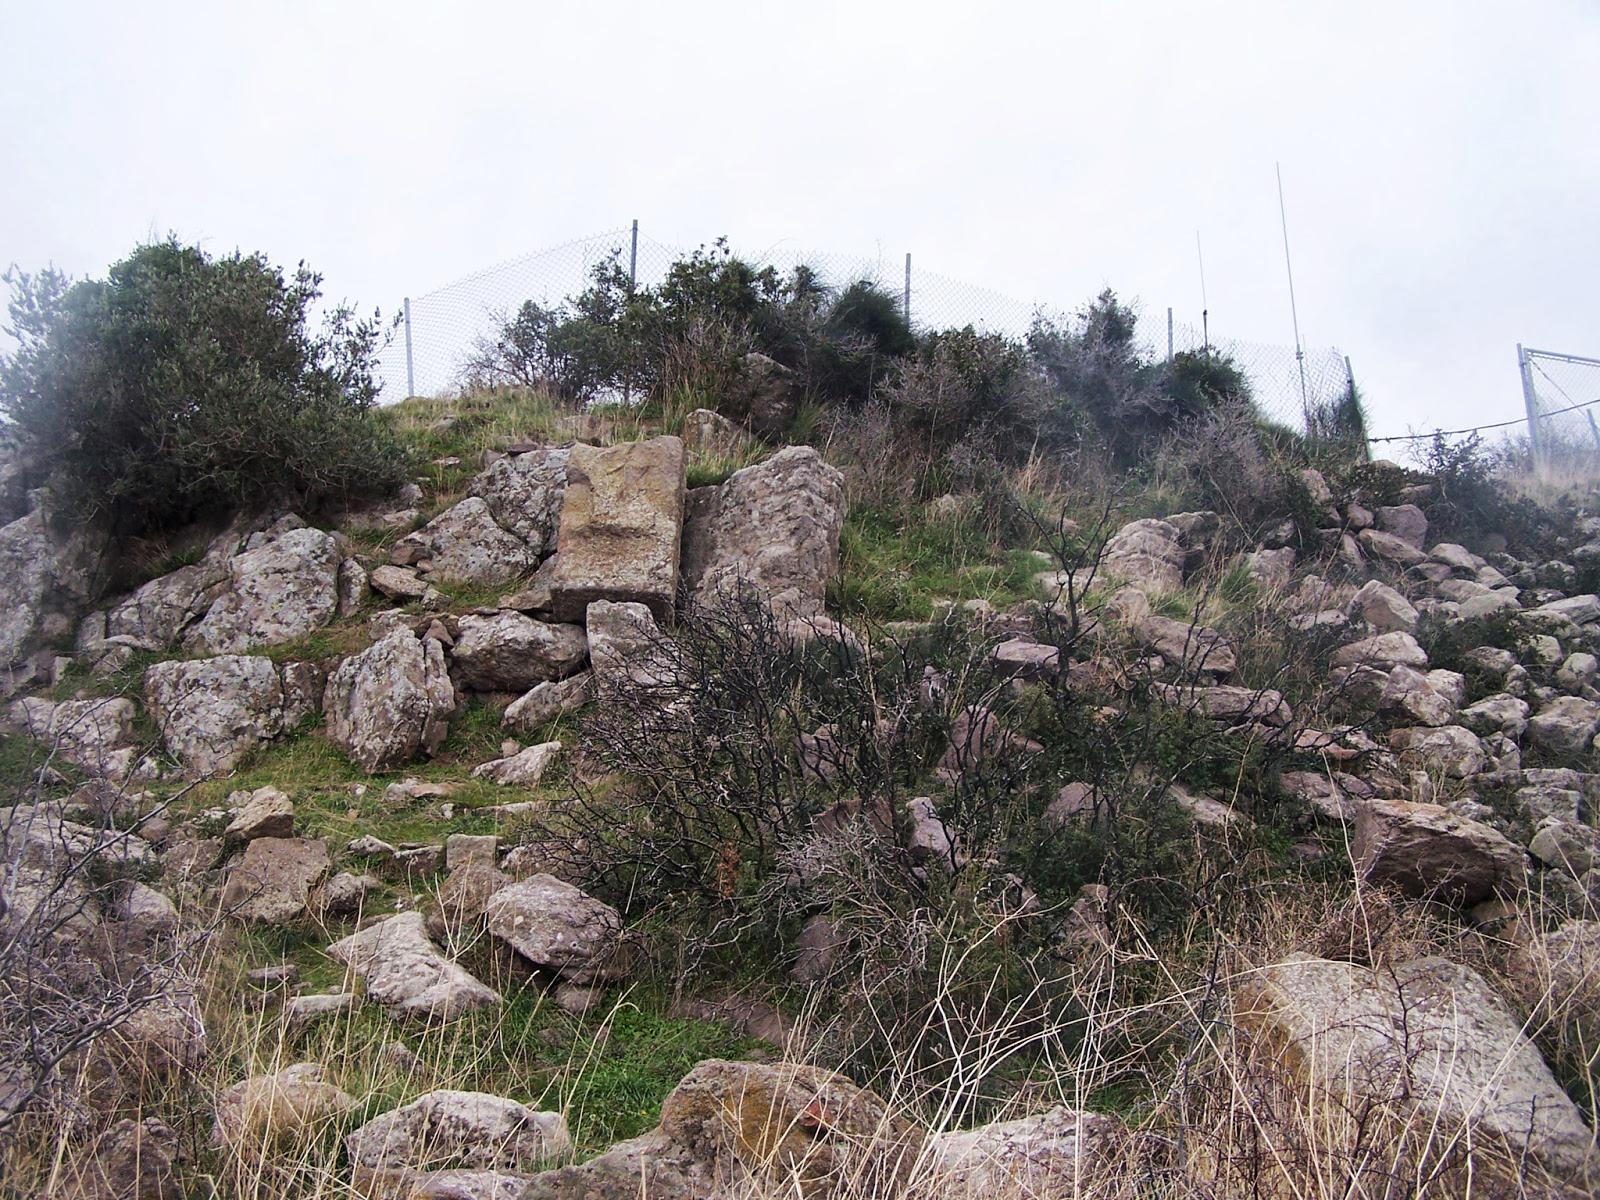 akropol-002-lento-parcalari-ibrahim-fidanoglu